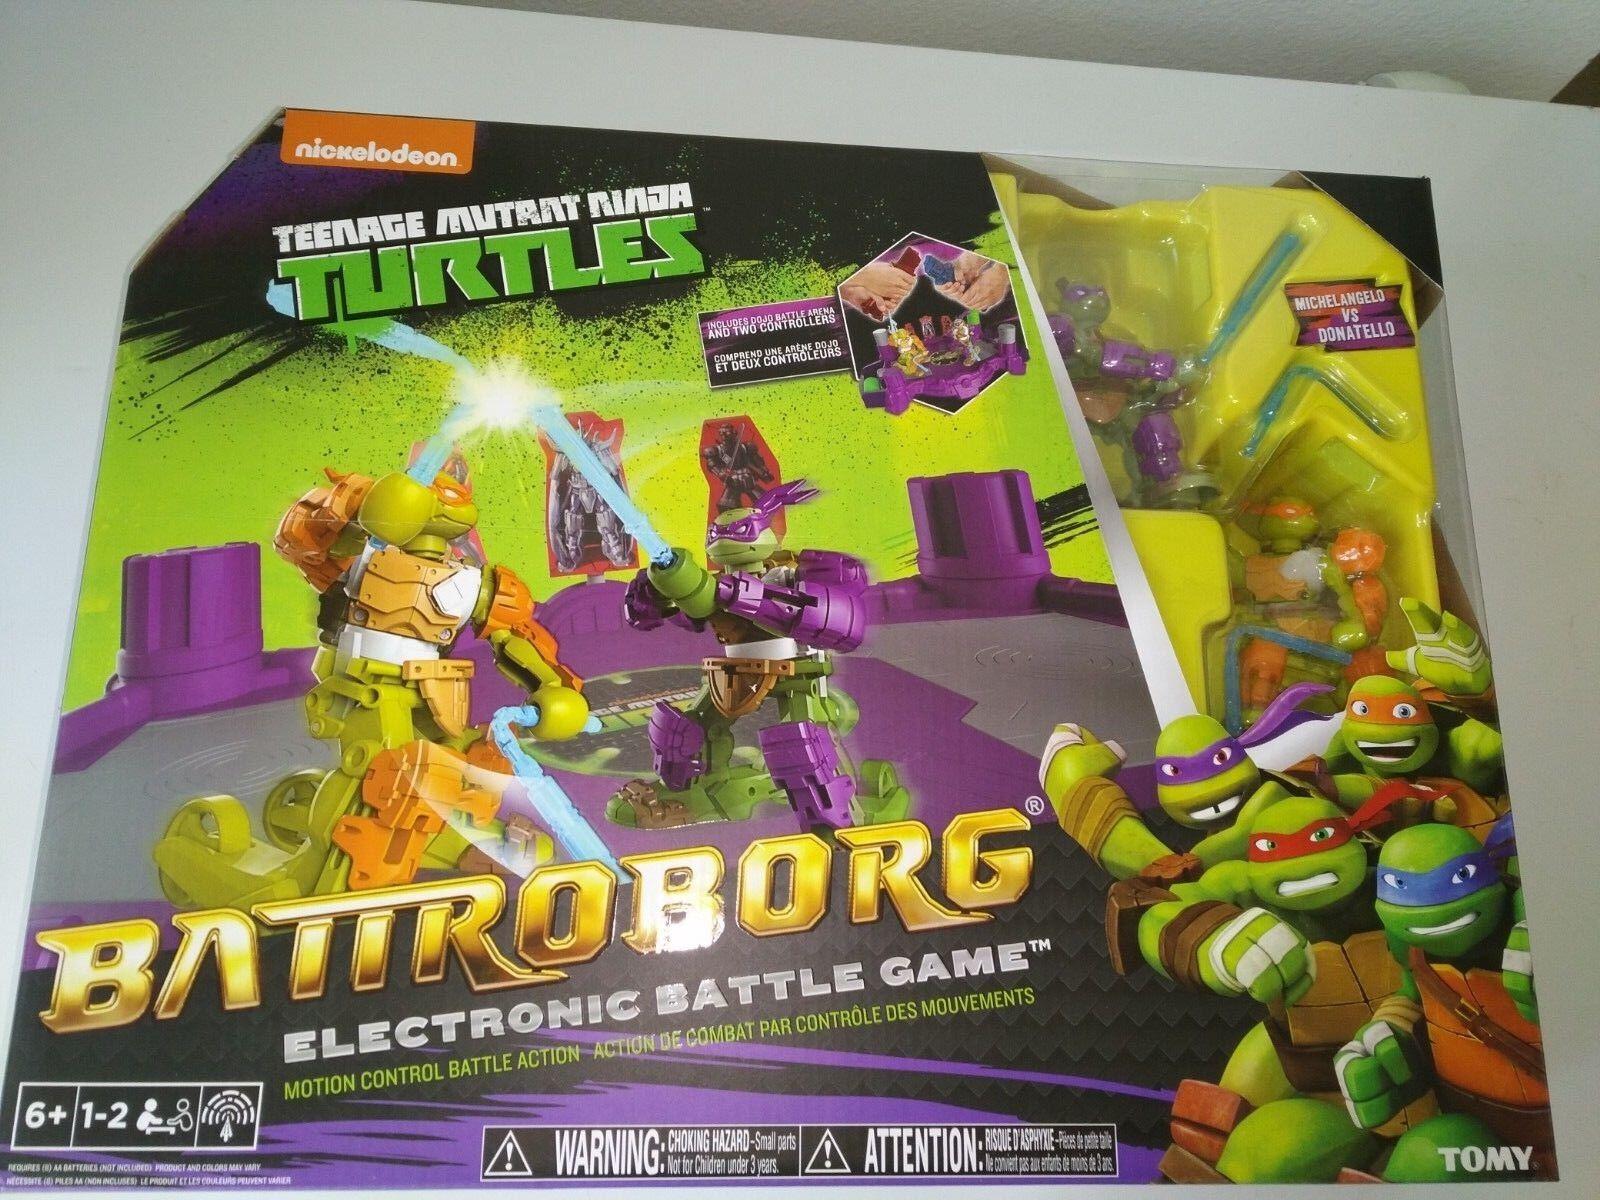 Nib battroborg teenage mutant ninja turtles - donatello und michelangelo